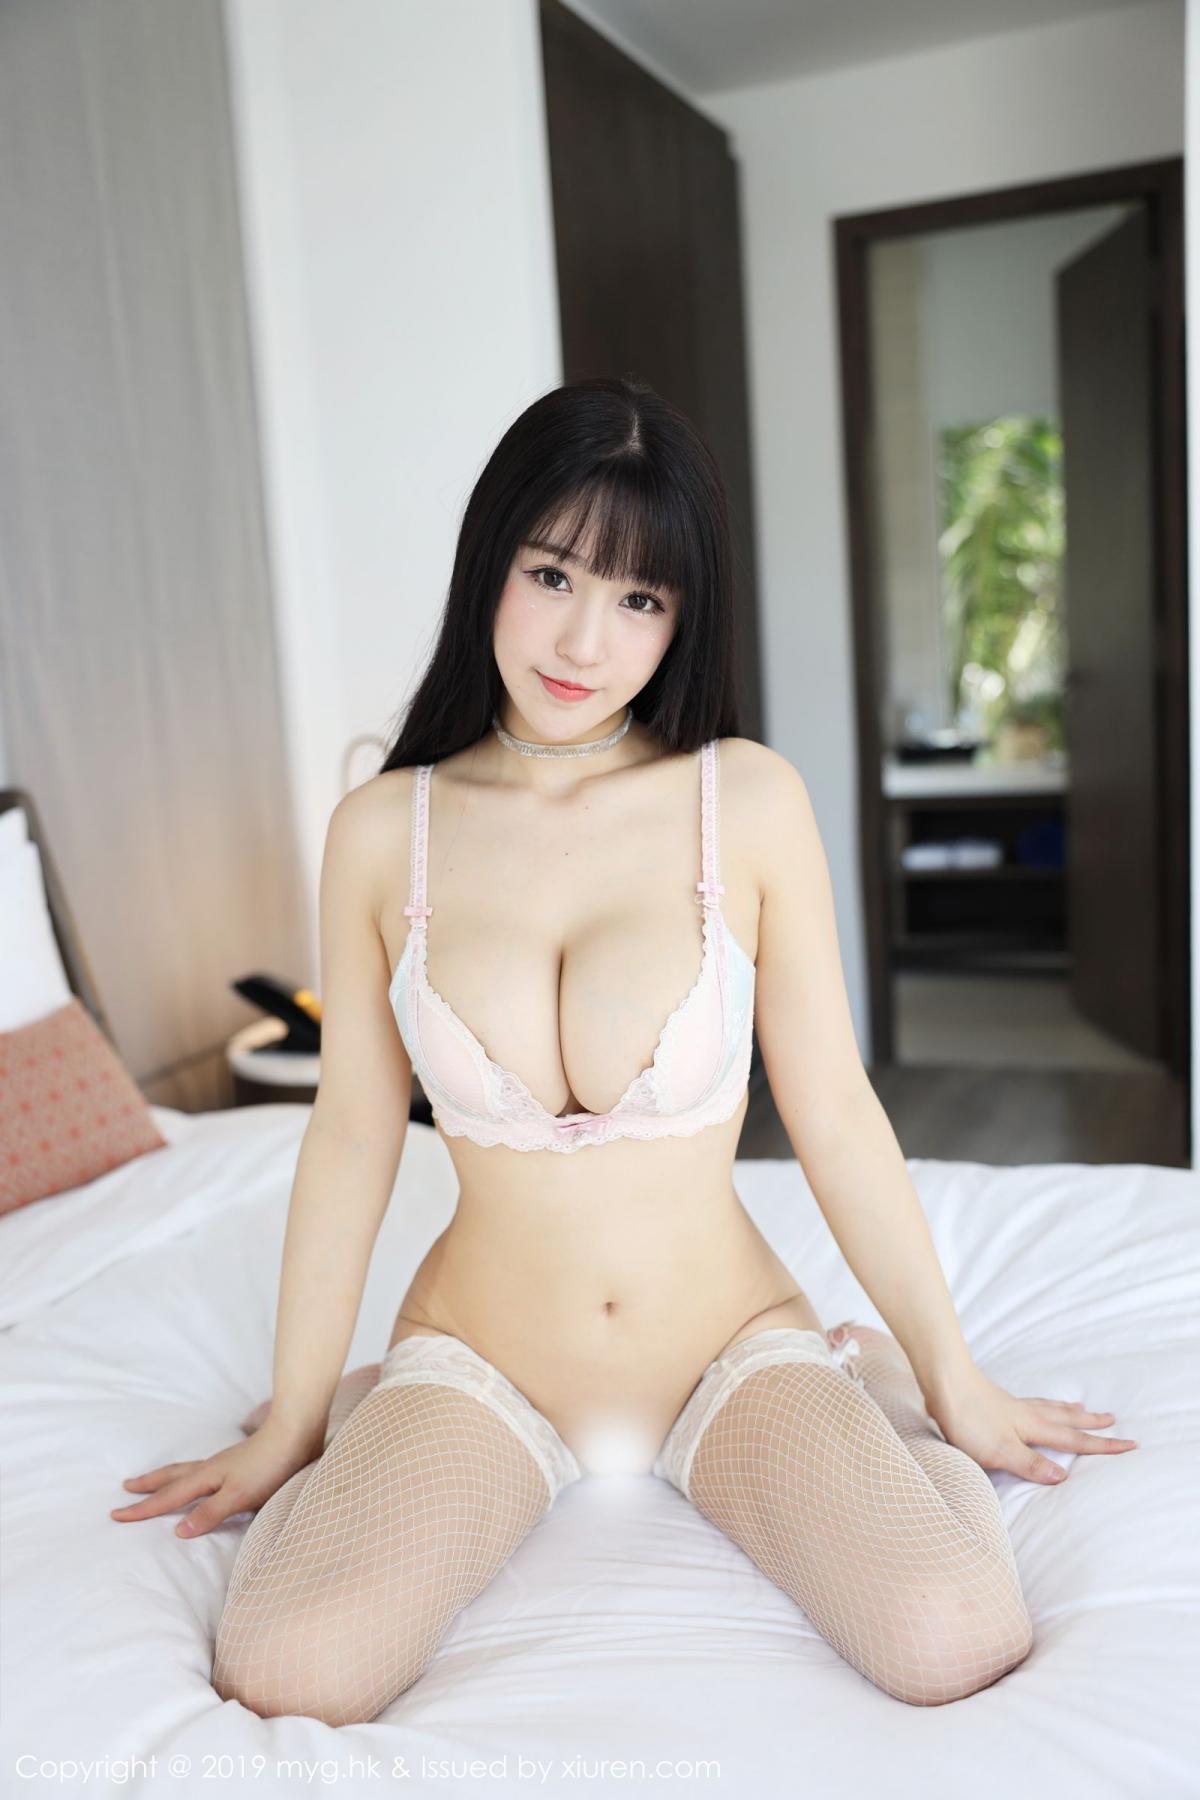 [MyGirl] Vol.364 Zhu Ke Er 23P, mygirl, Underwear, Zhu Ke Er